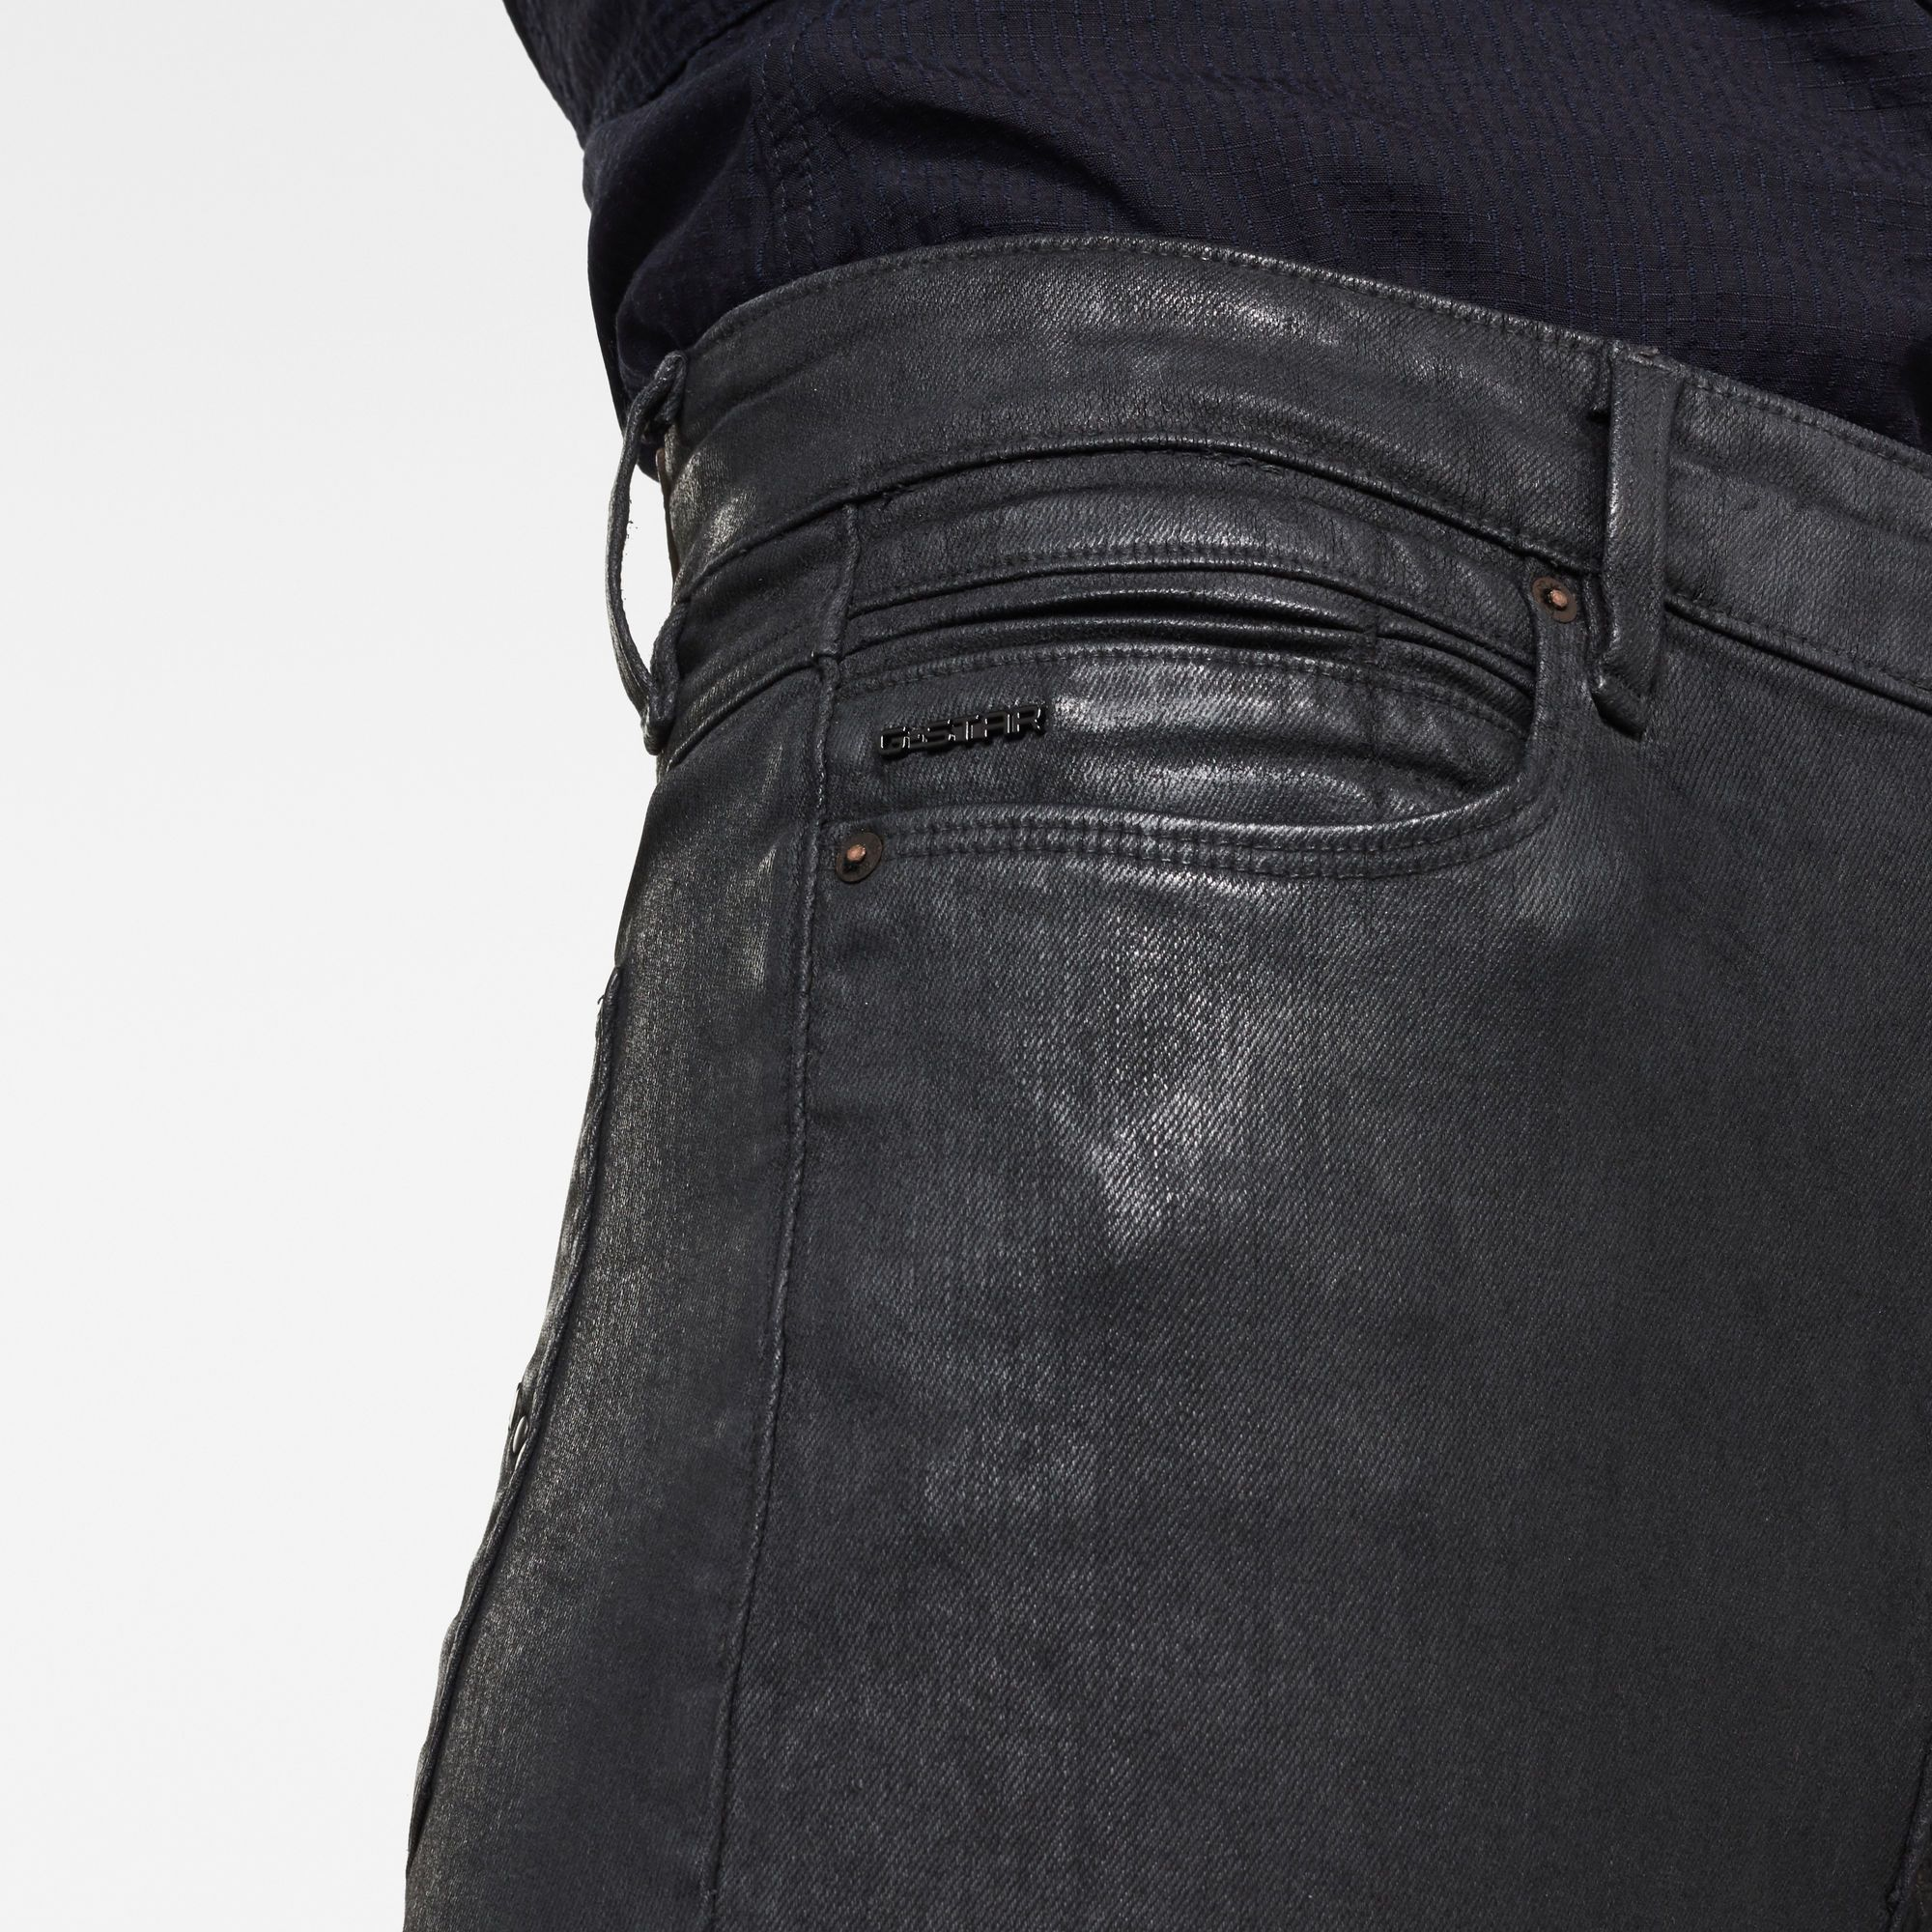 G-Star RAW G-Star Shape Studs High Super Skinny Jeans